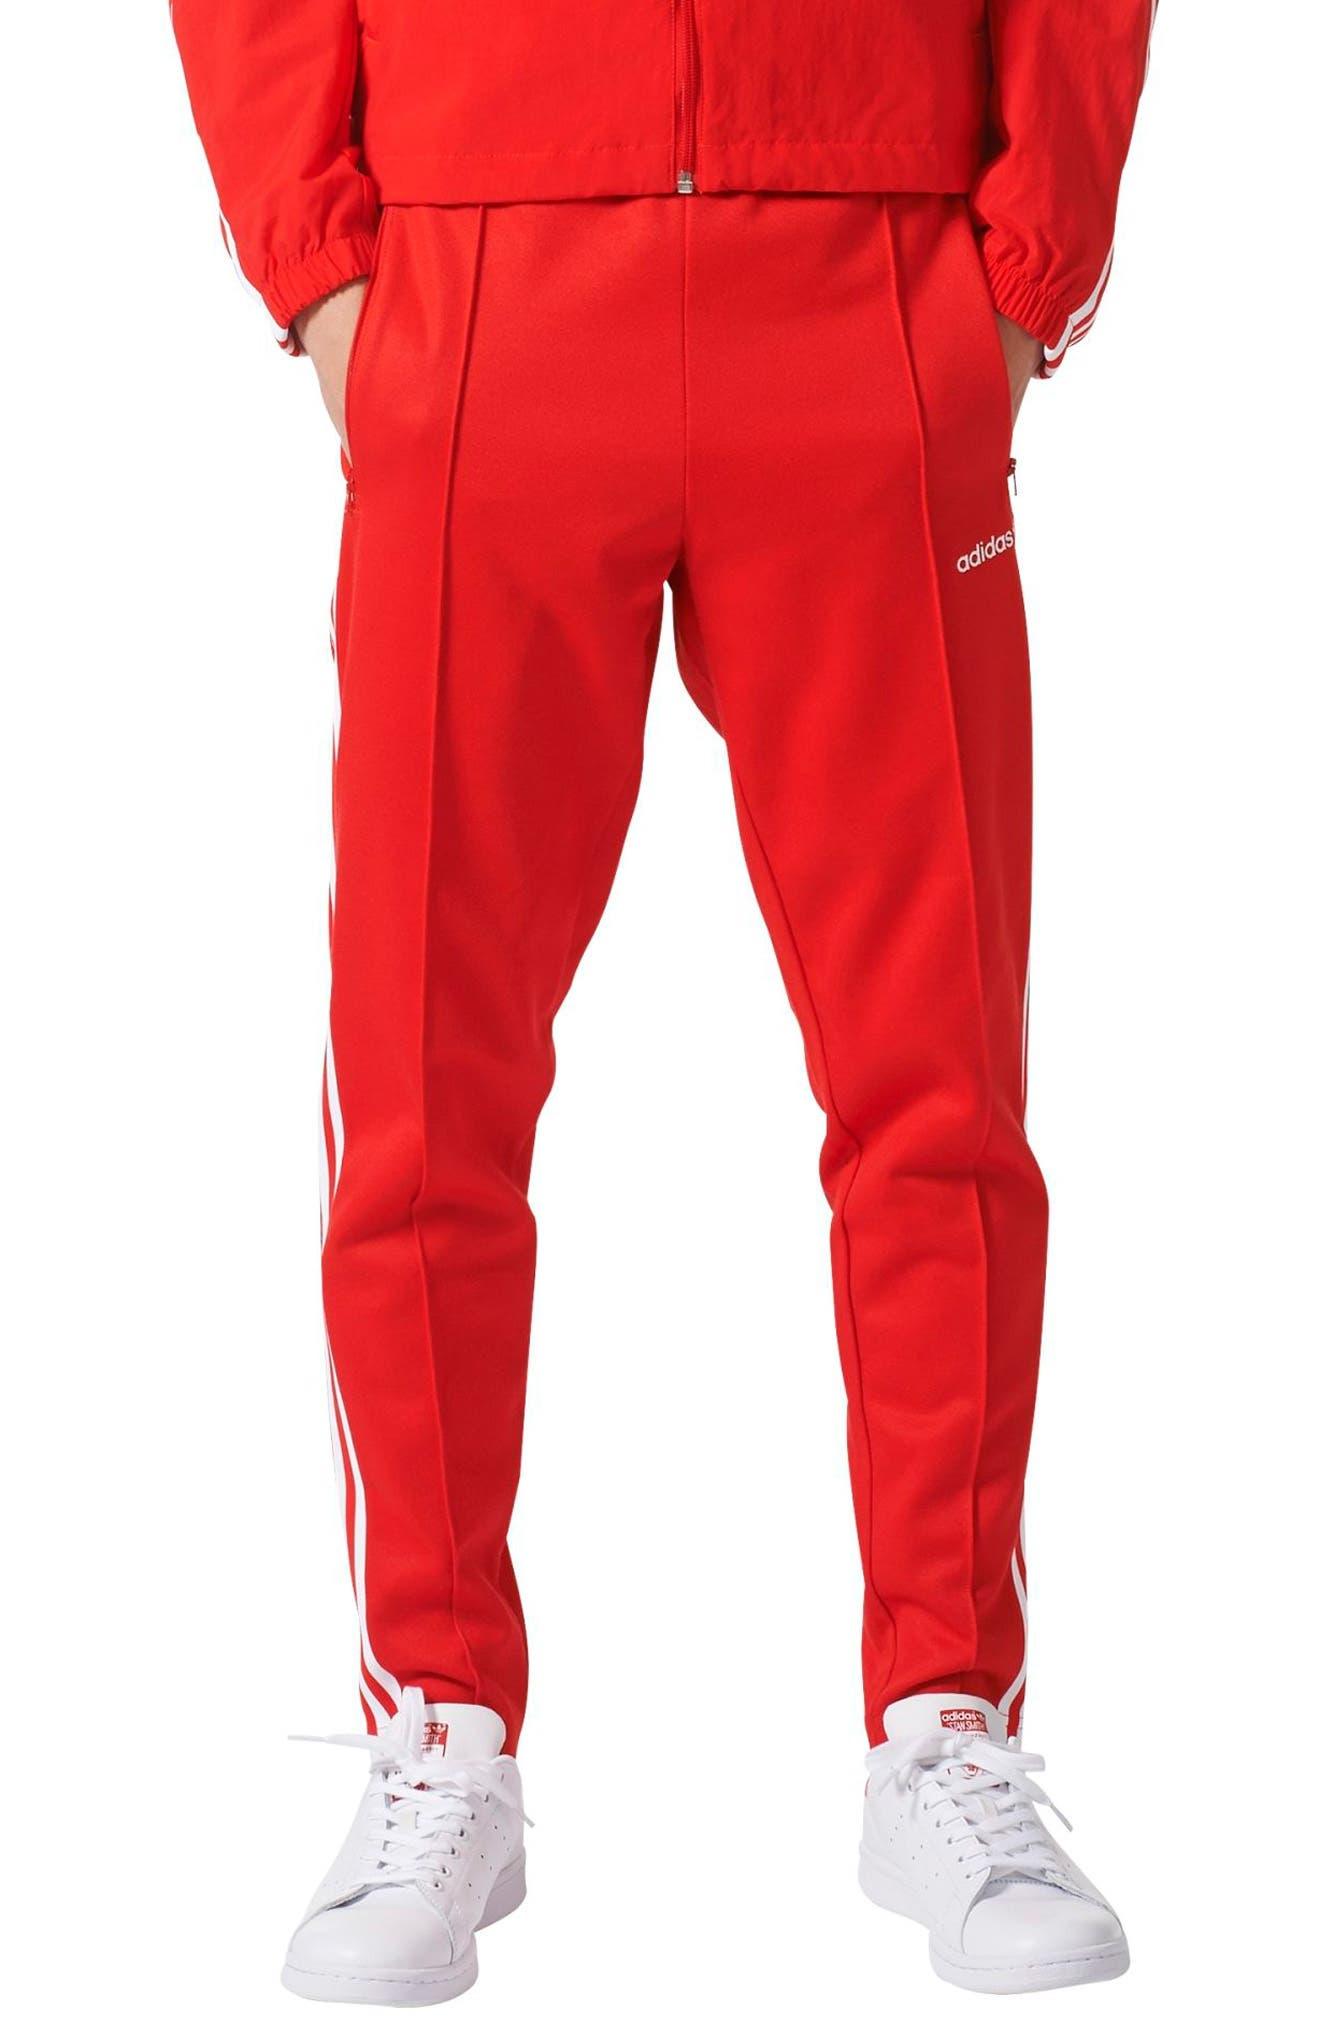 Alternate Image 1 Selected - adidas Originals Beckenbauer Track Pants